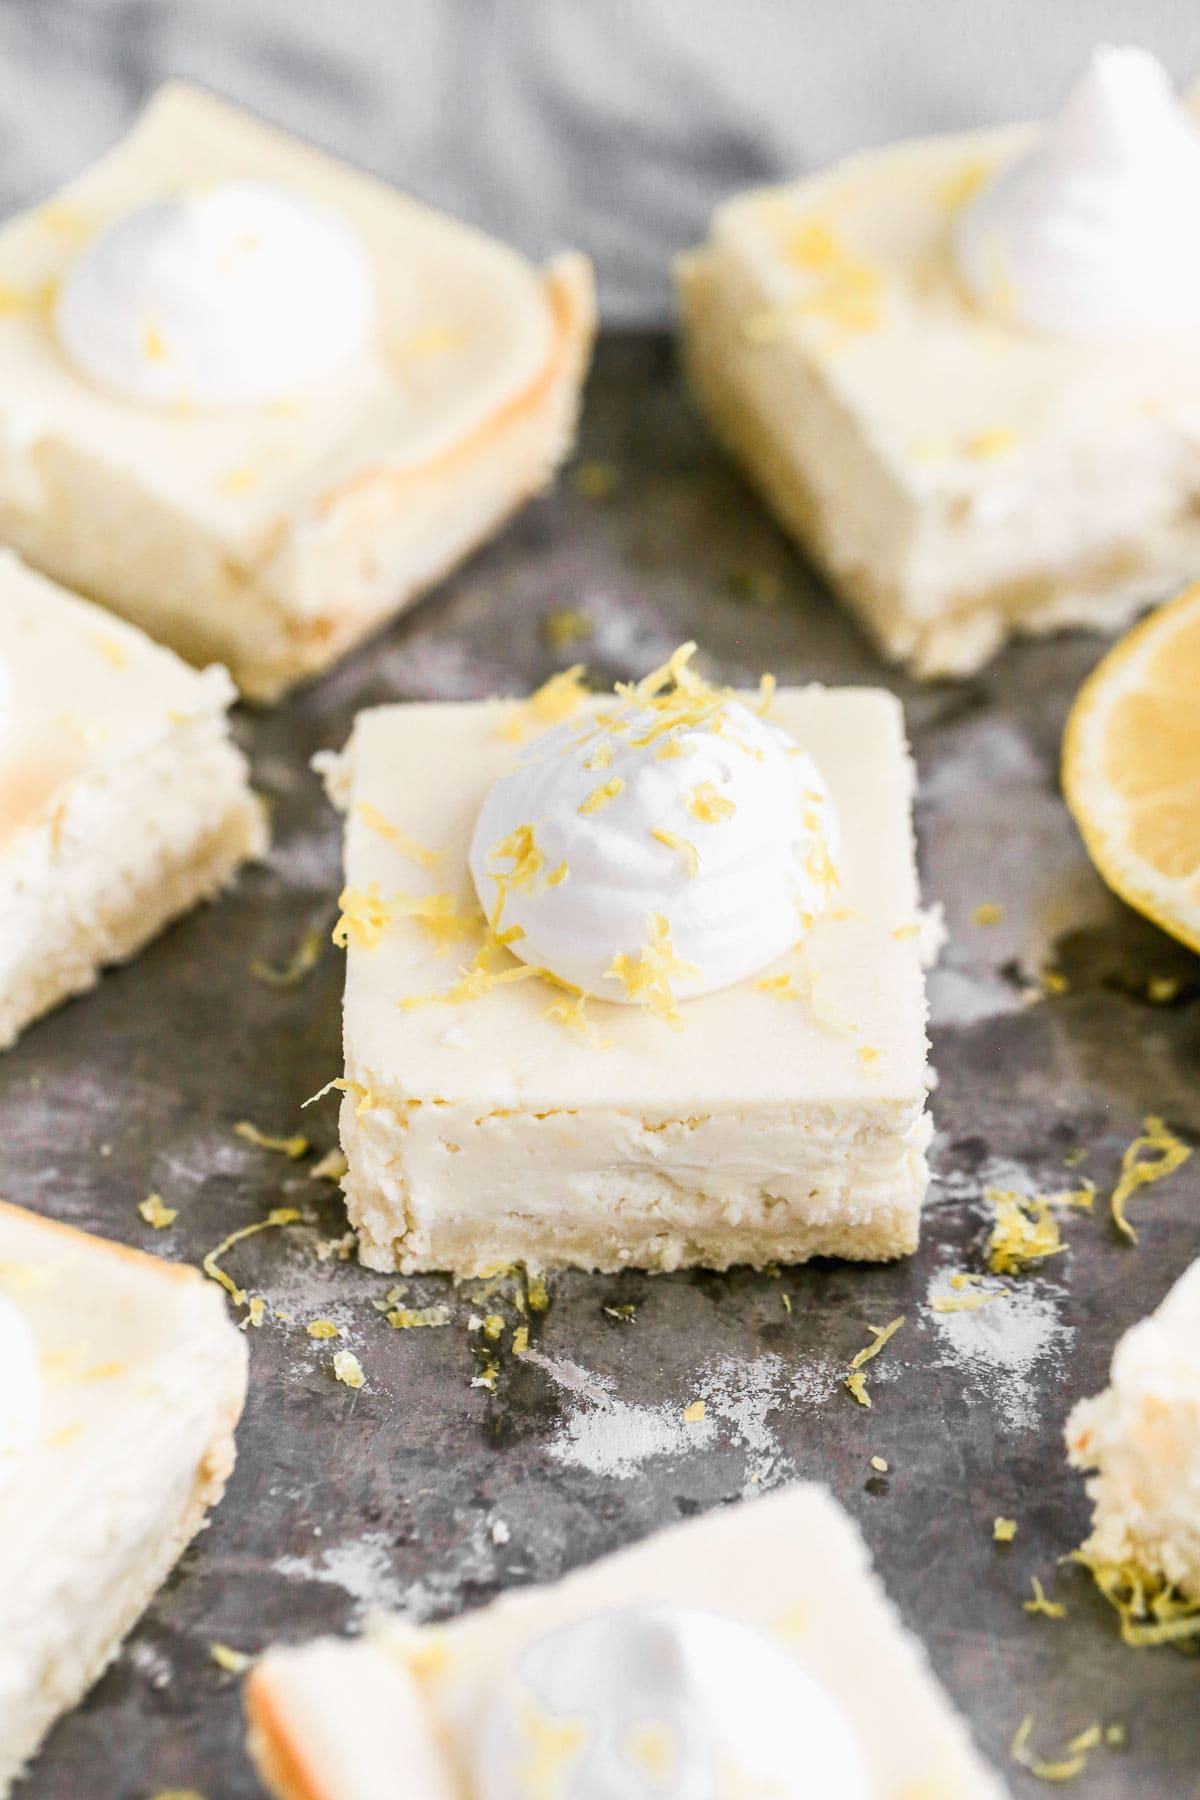 Simple and delicious Strawberry Lemon Cream Cheese Bars cut into squares on a white quartz countertop